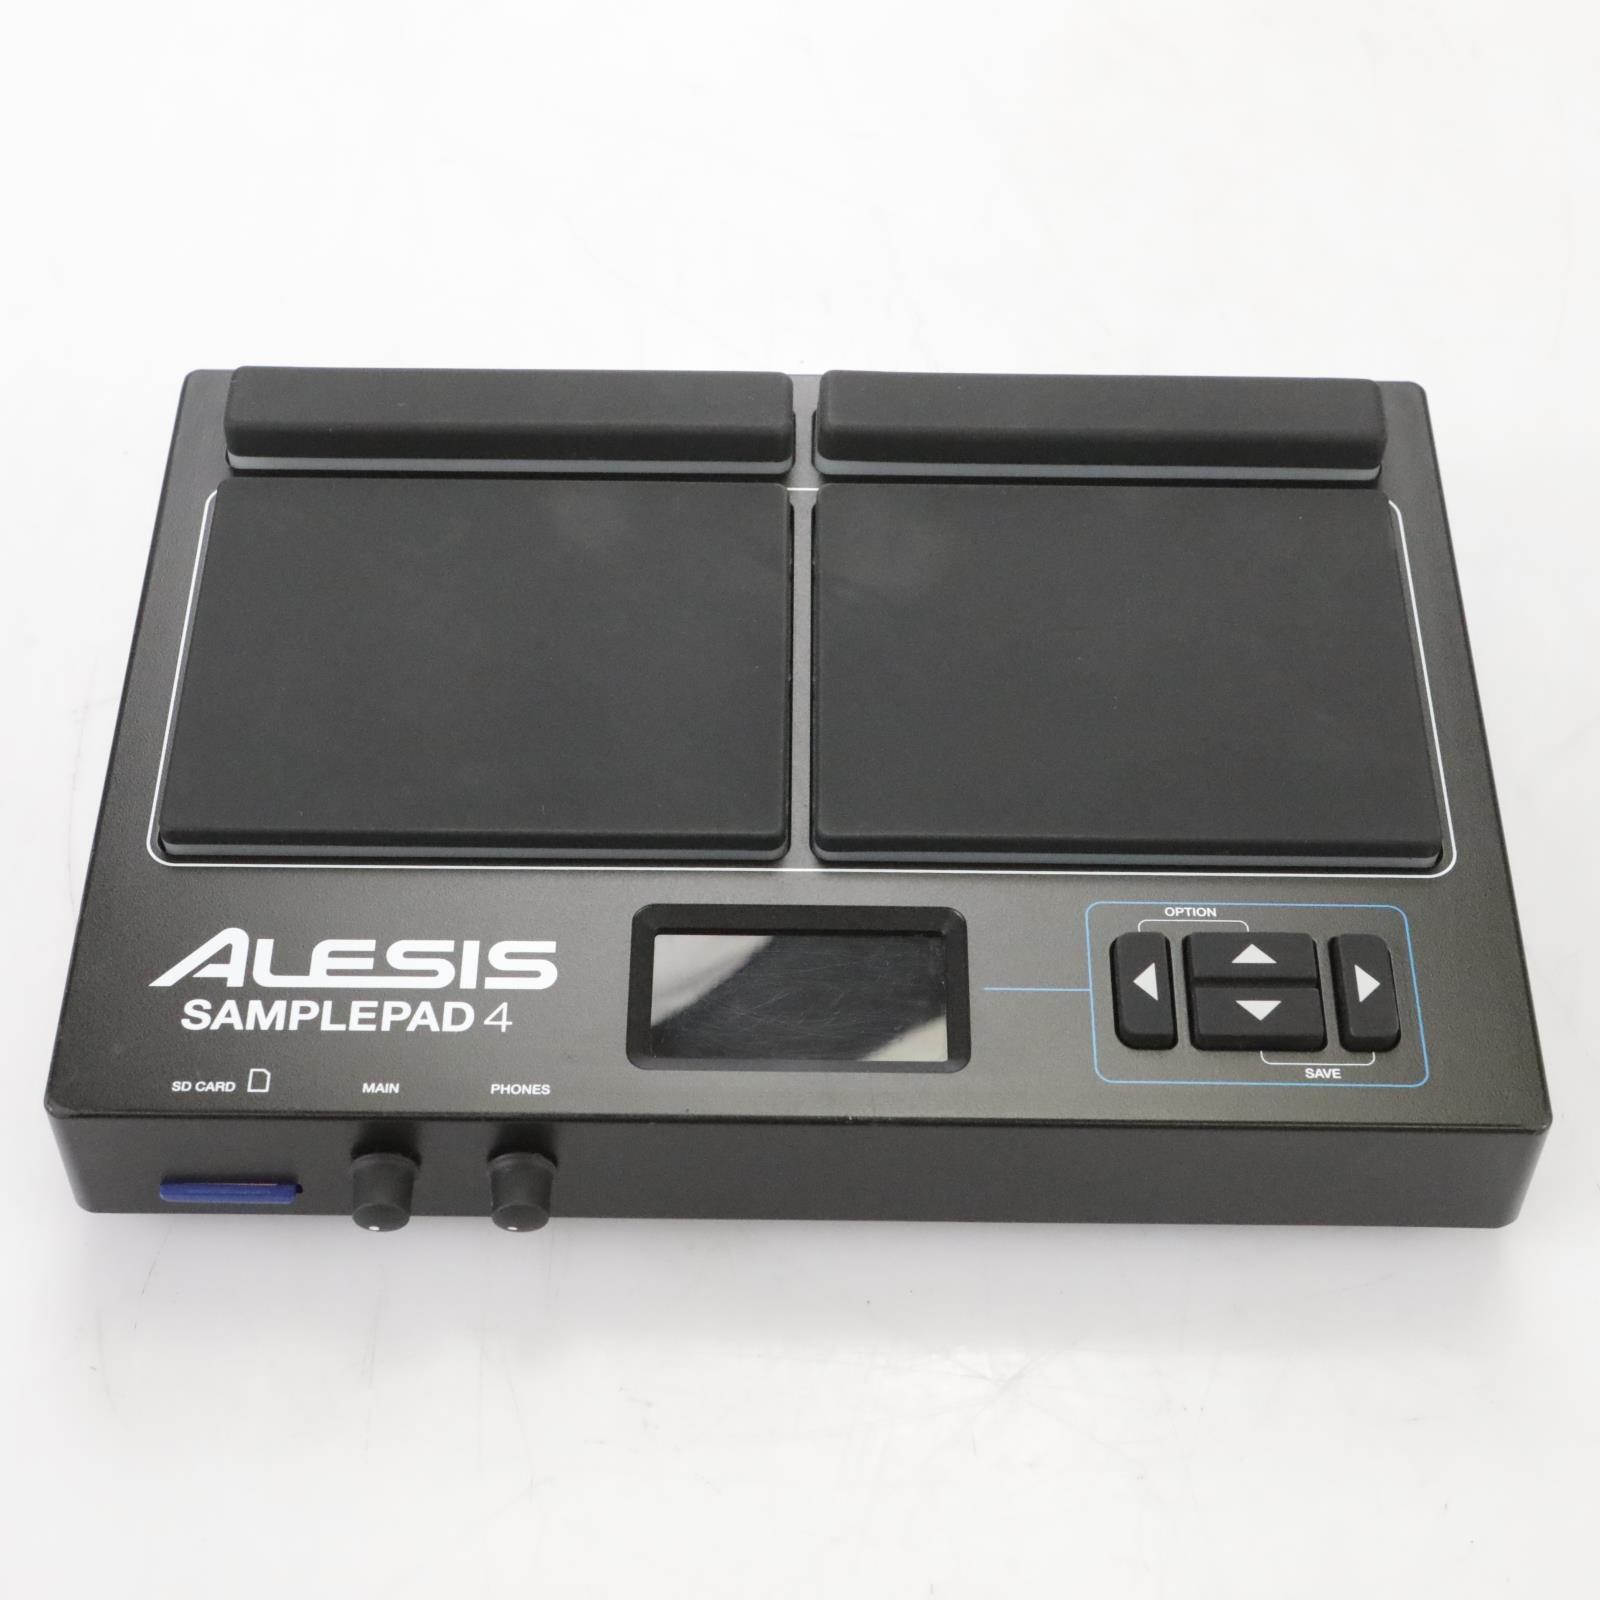 Alesis SamplePad 4 Multi-Pad Percussion Sampler Instrument w/ SD-Card #44387